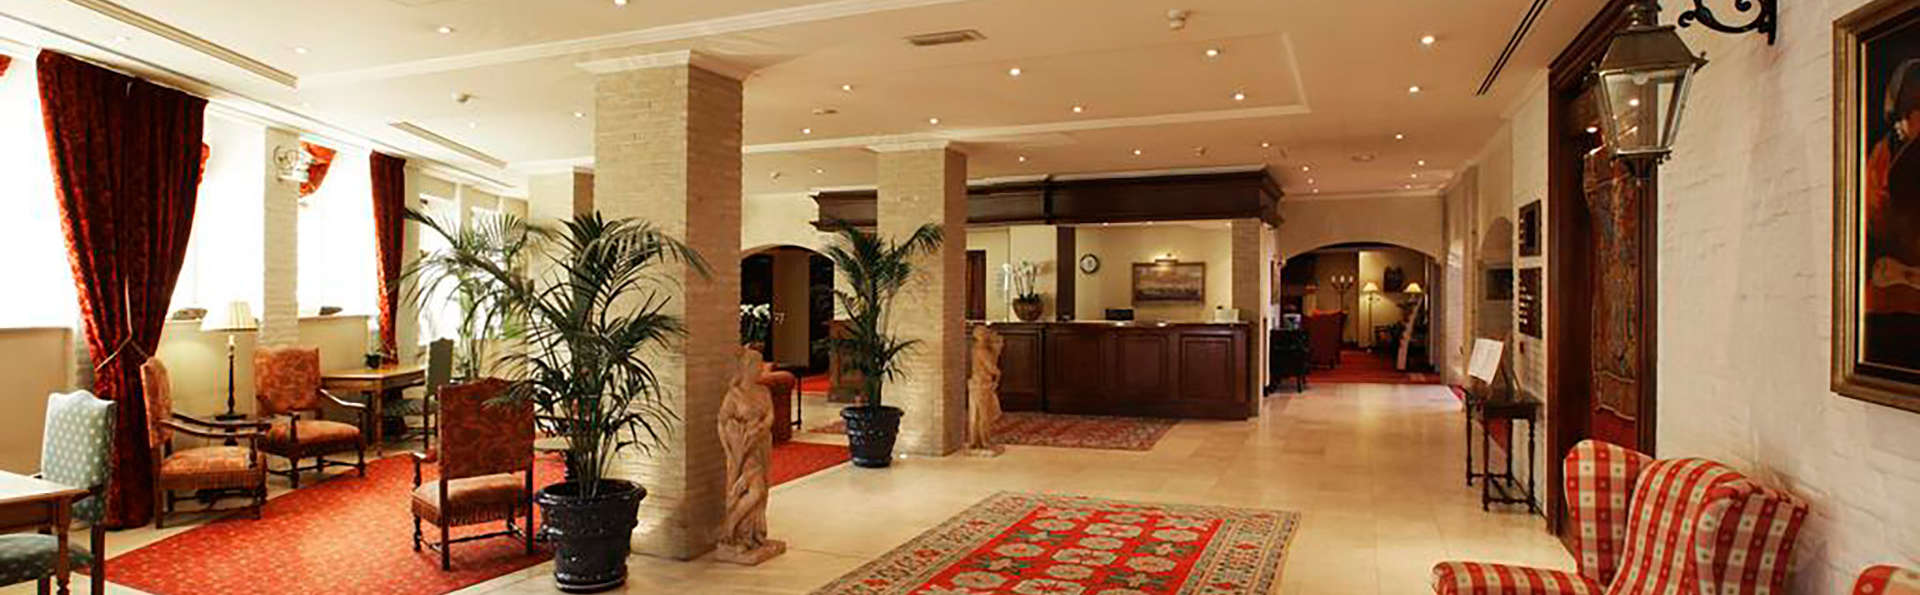 NH Hotel Brugge - EDIT_LOBBY_01.jpg